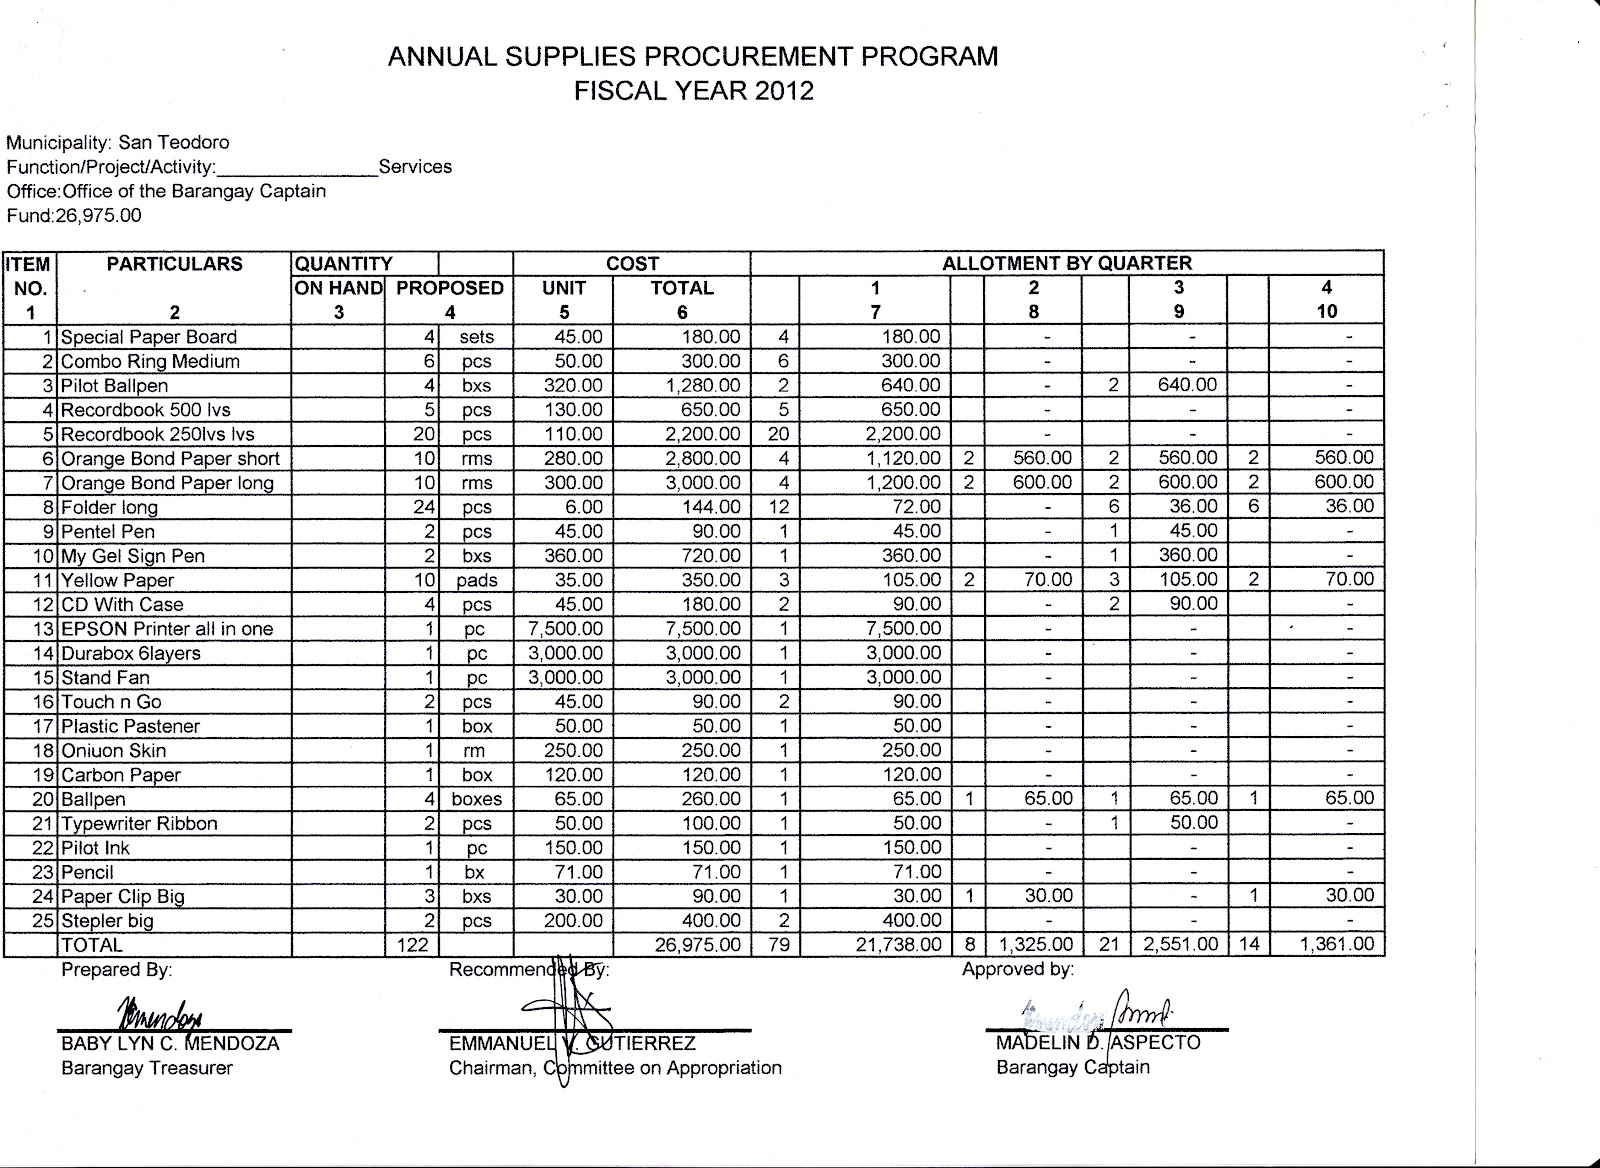 procurement document template - lgu san teodoro full disclosure of local finances annual